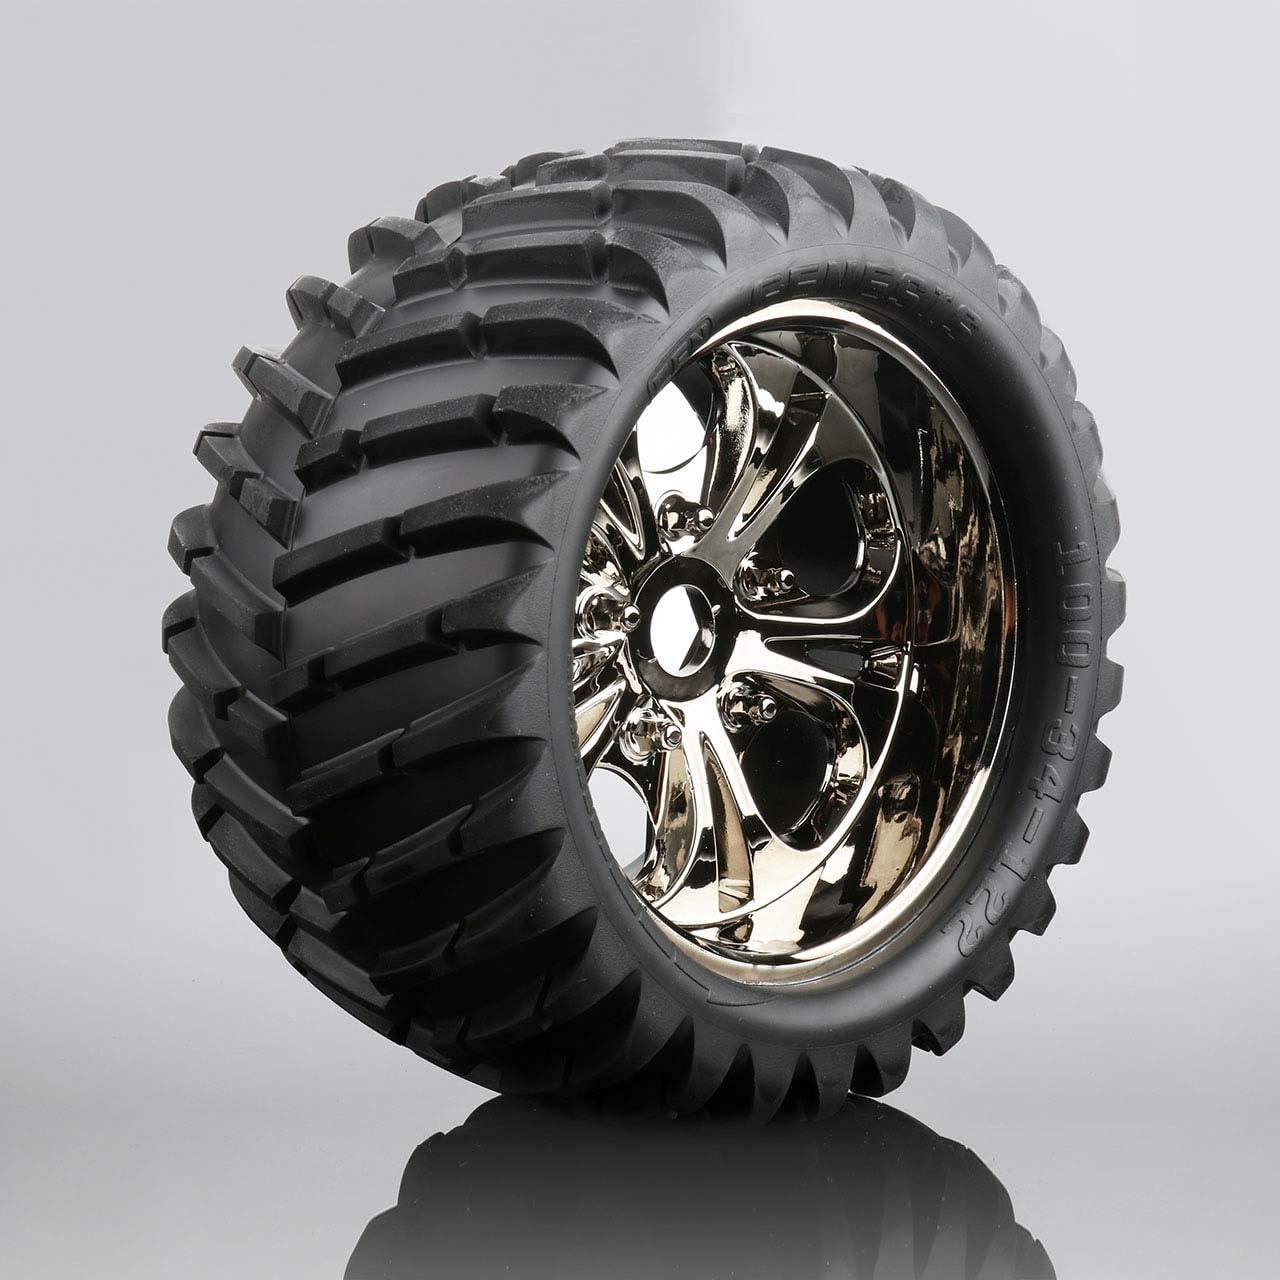 CEN Racing CEGCKR0505 V-Pattern 贈物 Tires Pre-Glu1Pr for Wheels 新品■送料無料■